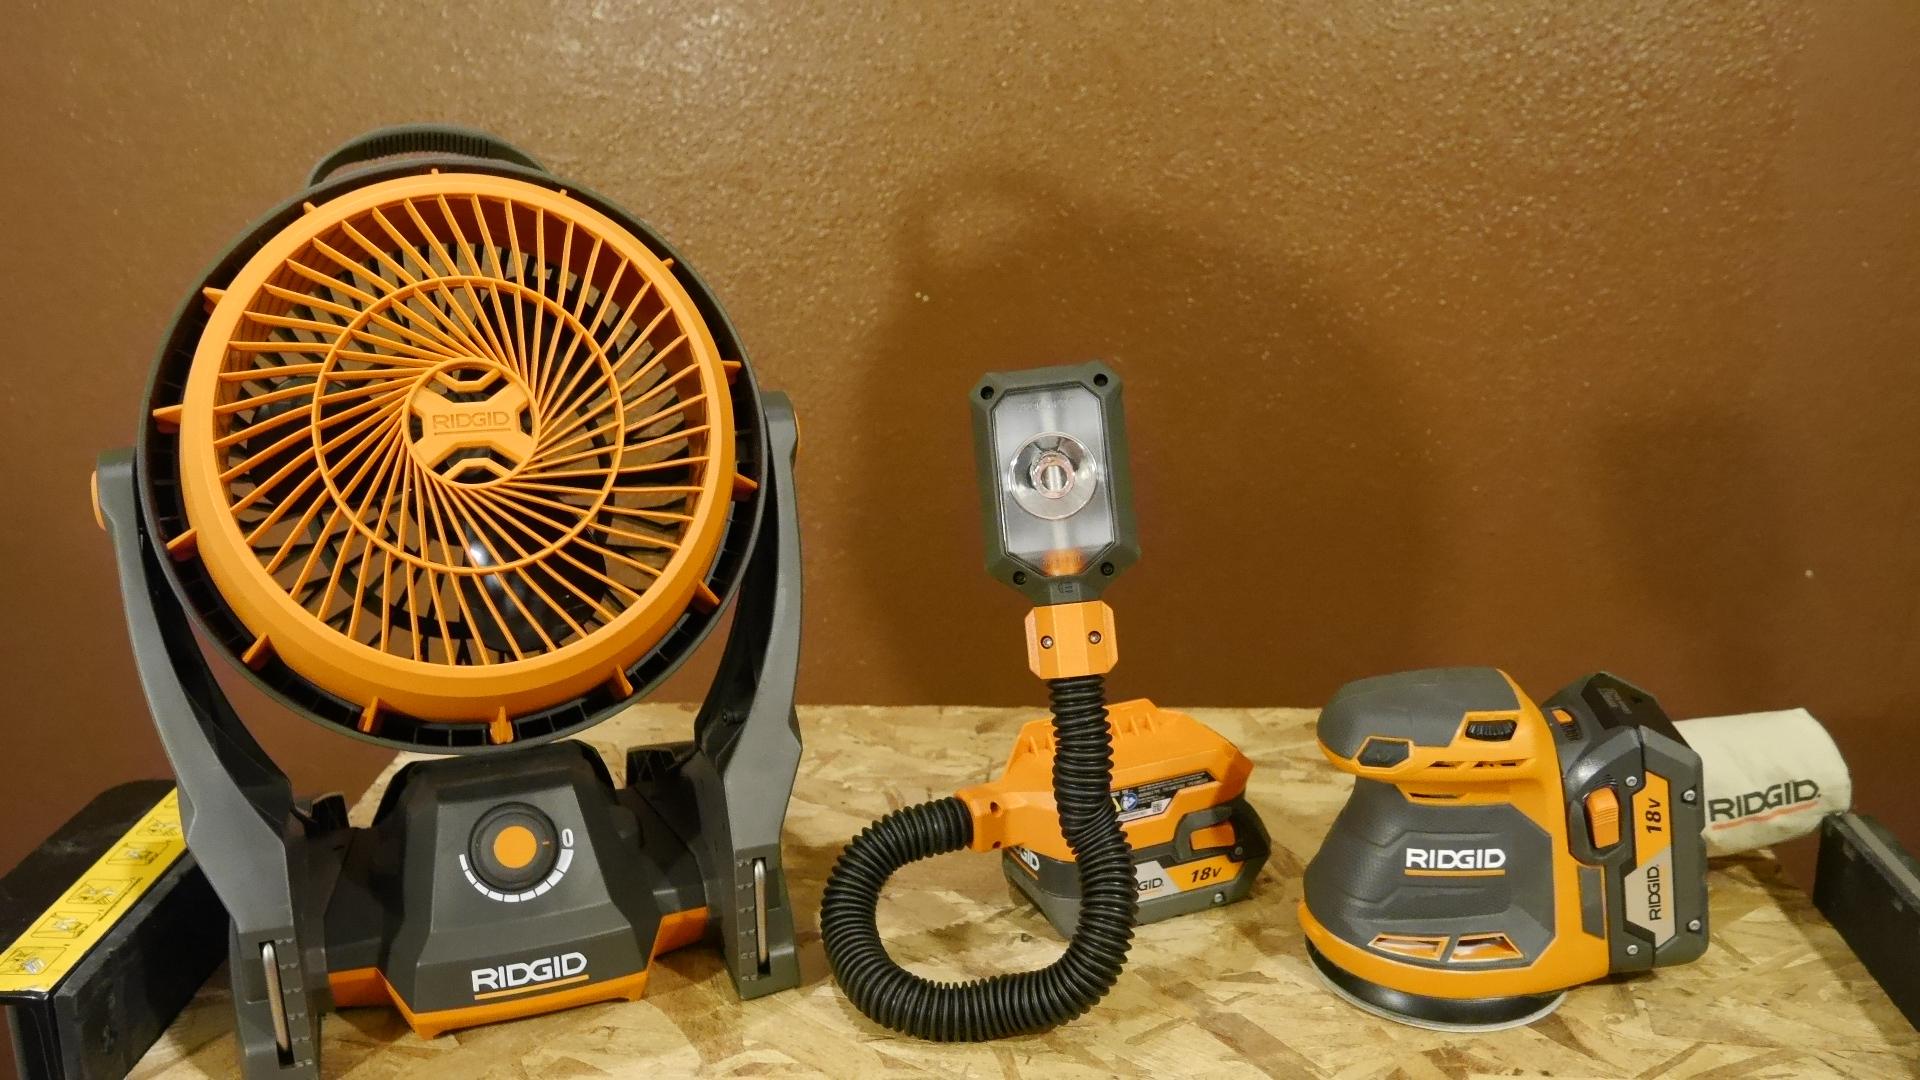 New Ridgid 18v X5 Cordless Tools Sander Fan Work